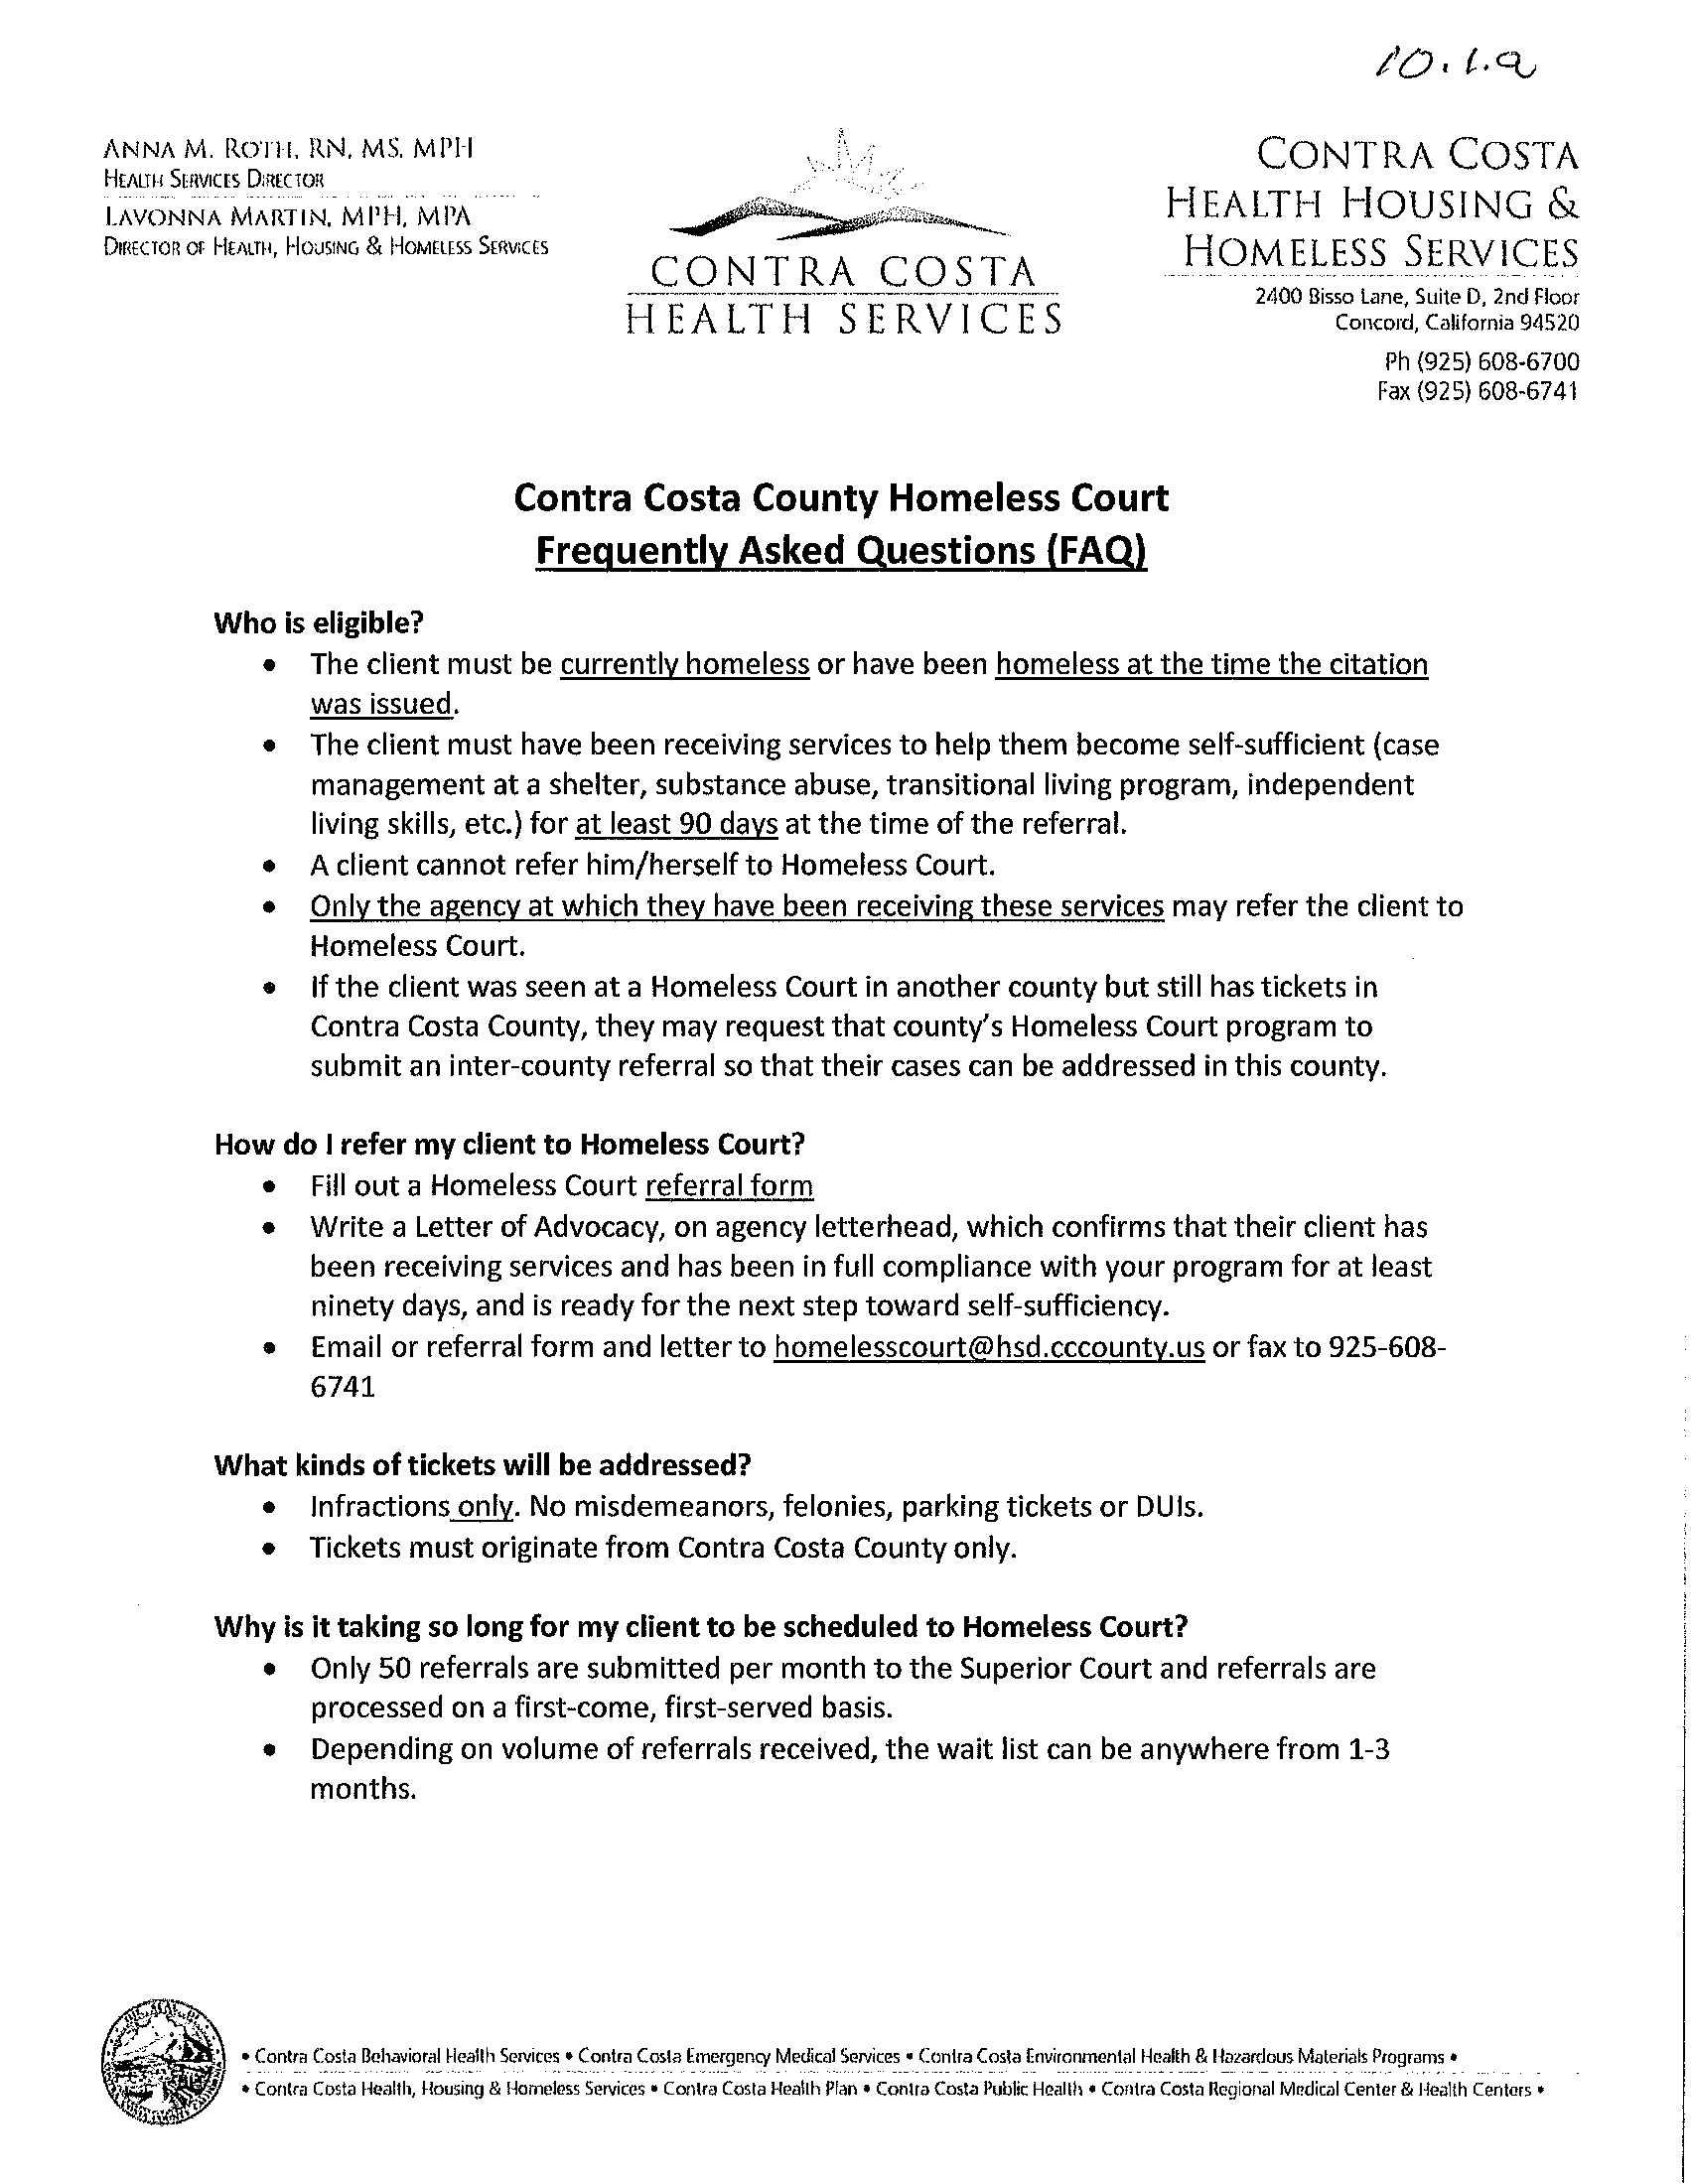 ESMAC Agenda 09.12.2018 (22 Pages)_8.jpg